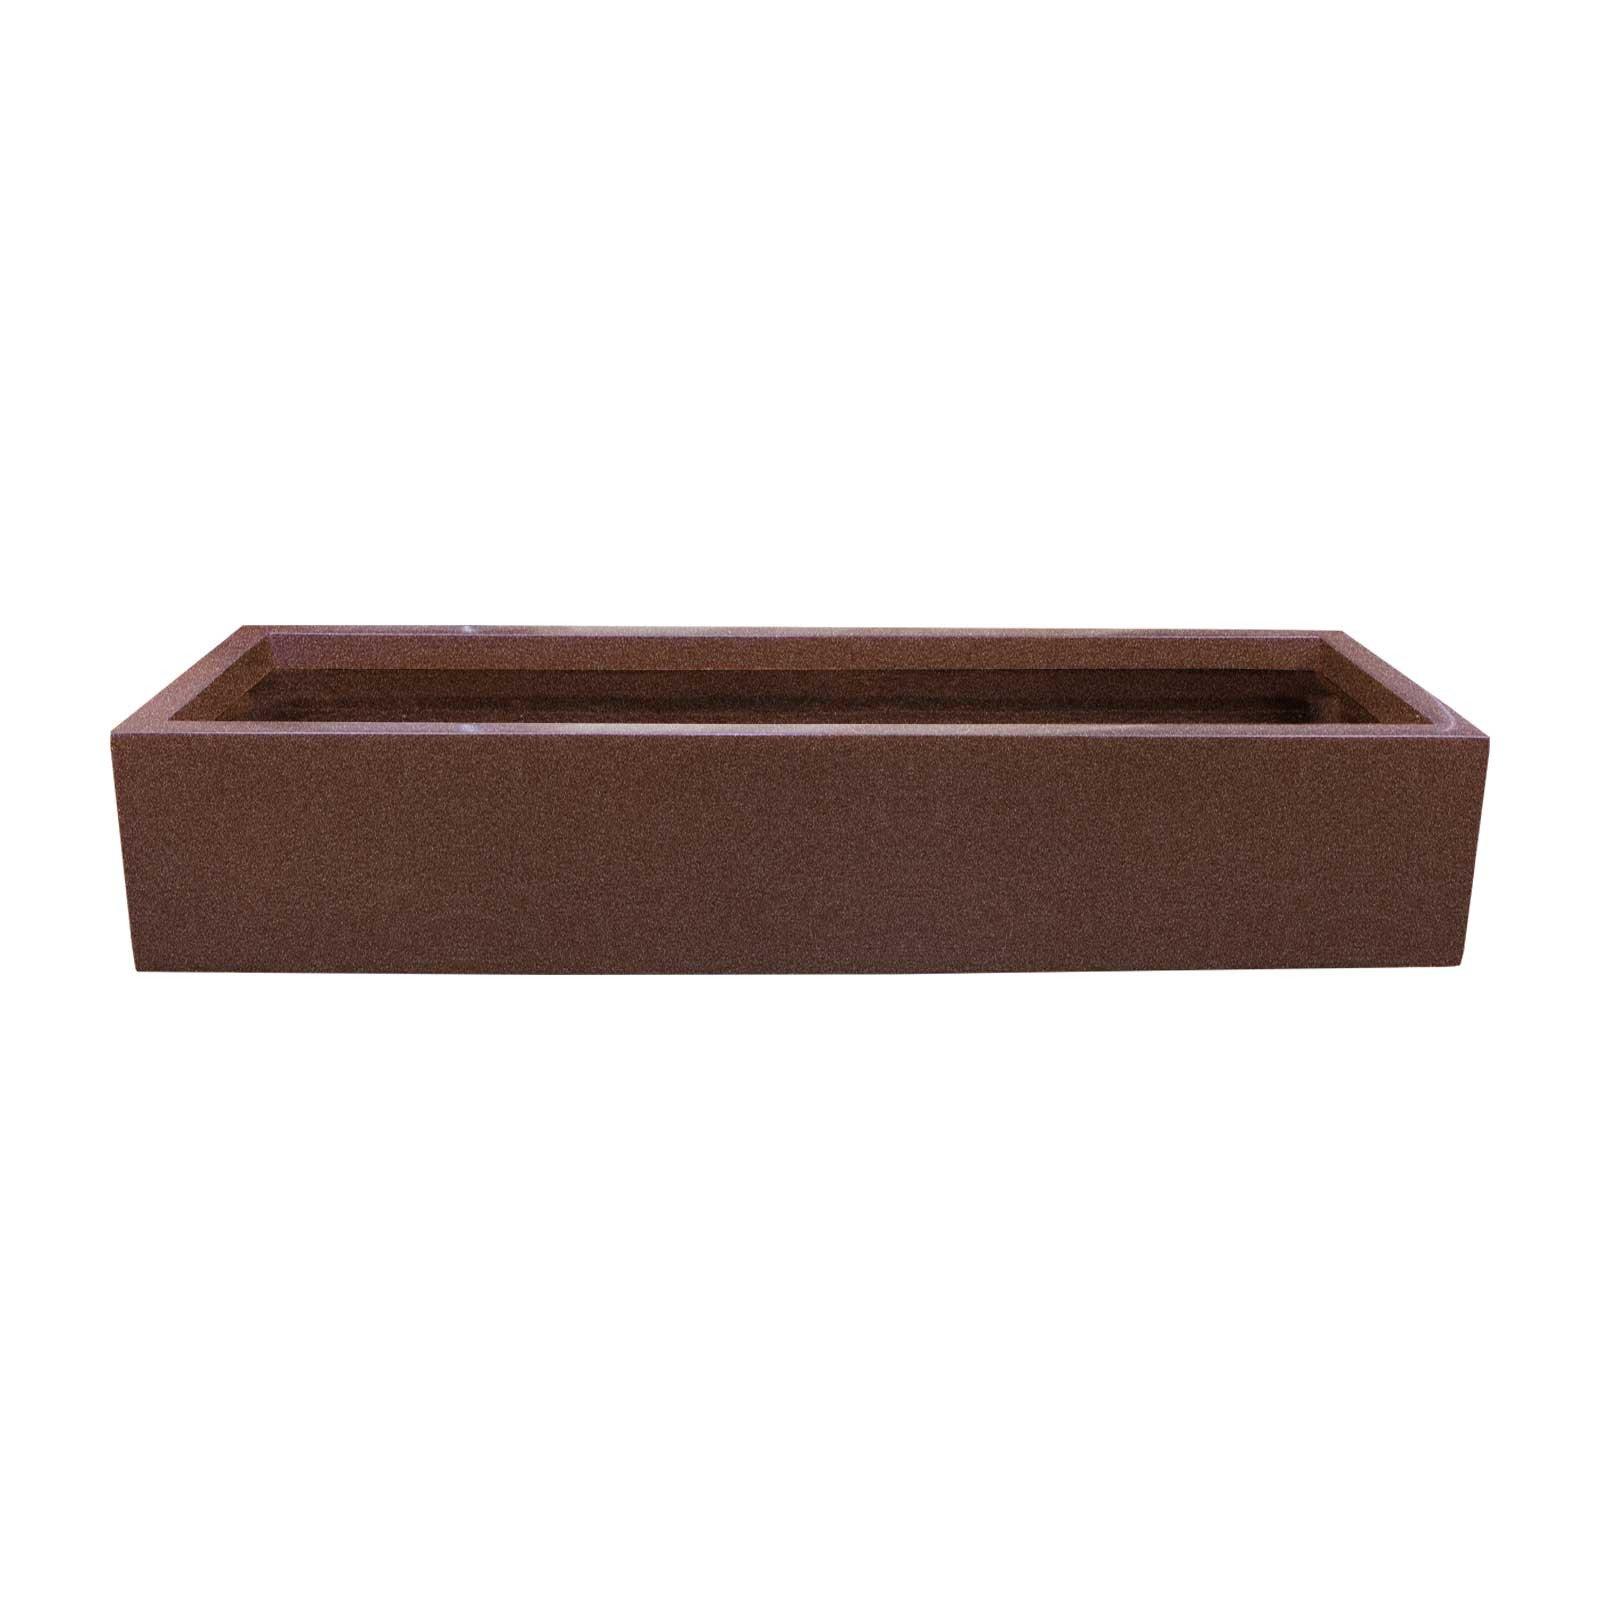 Outdoor Fiberglass Planter Box - 45'L x 15'W x 8'H